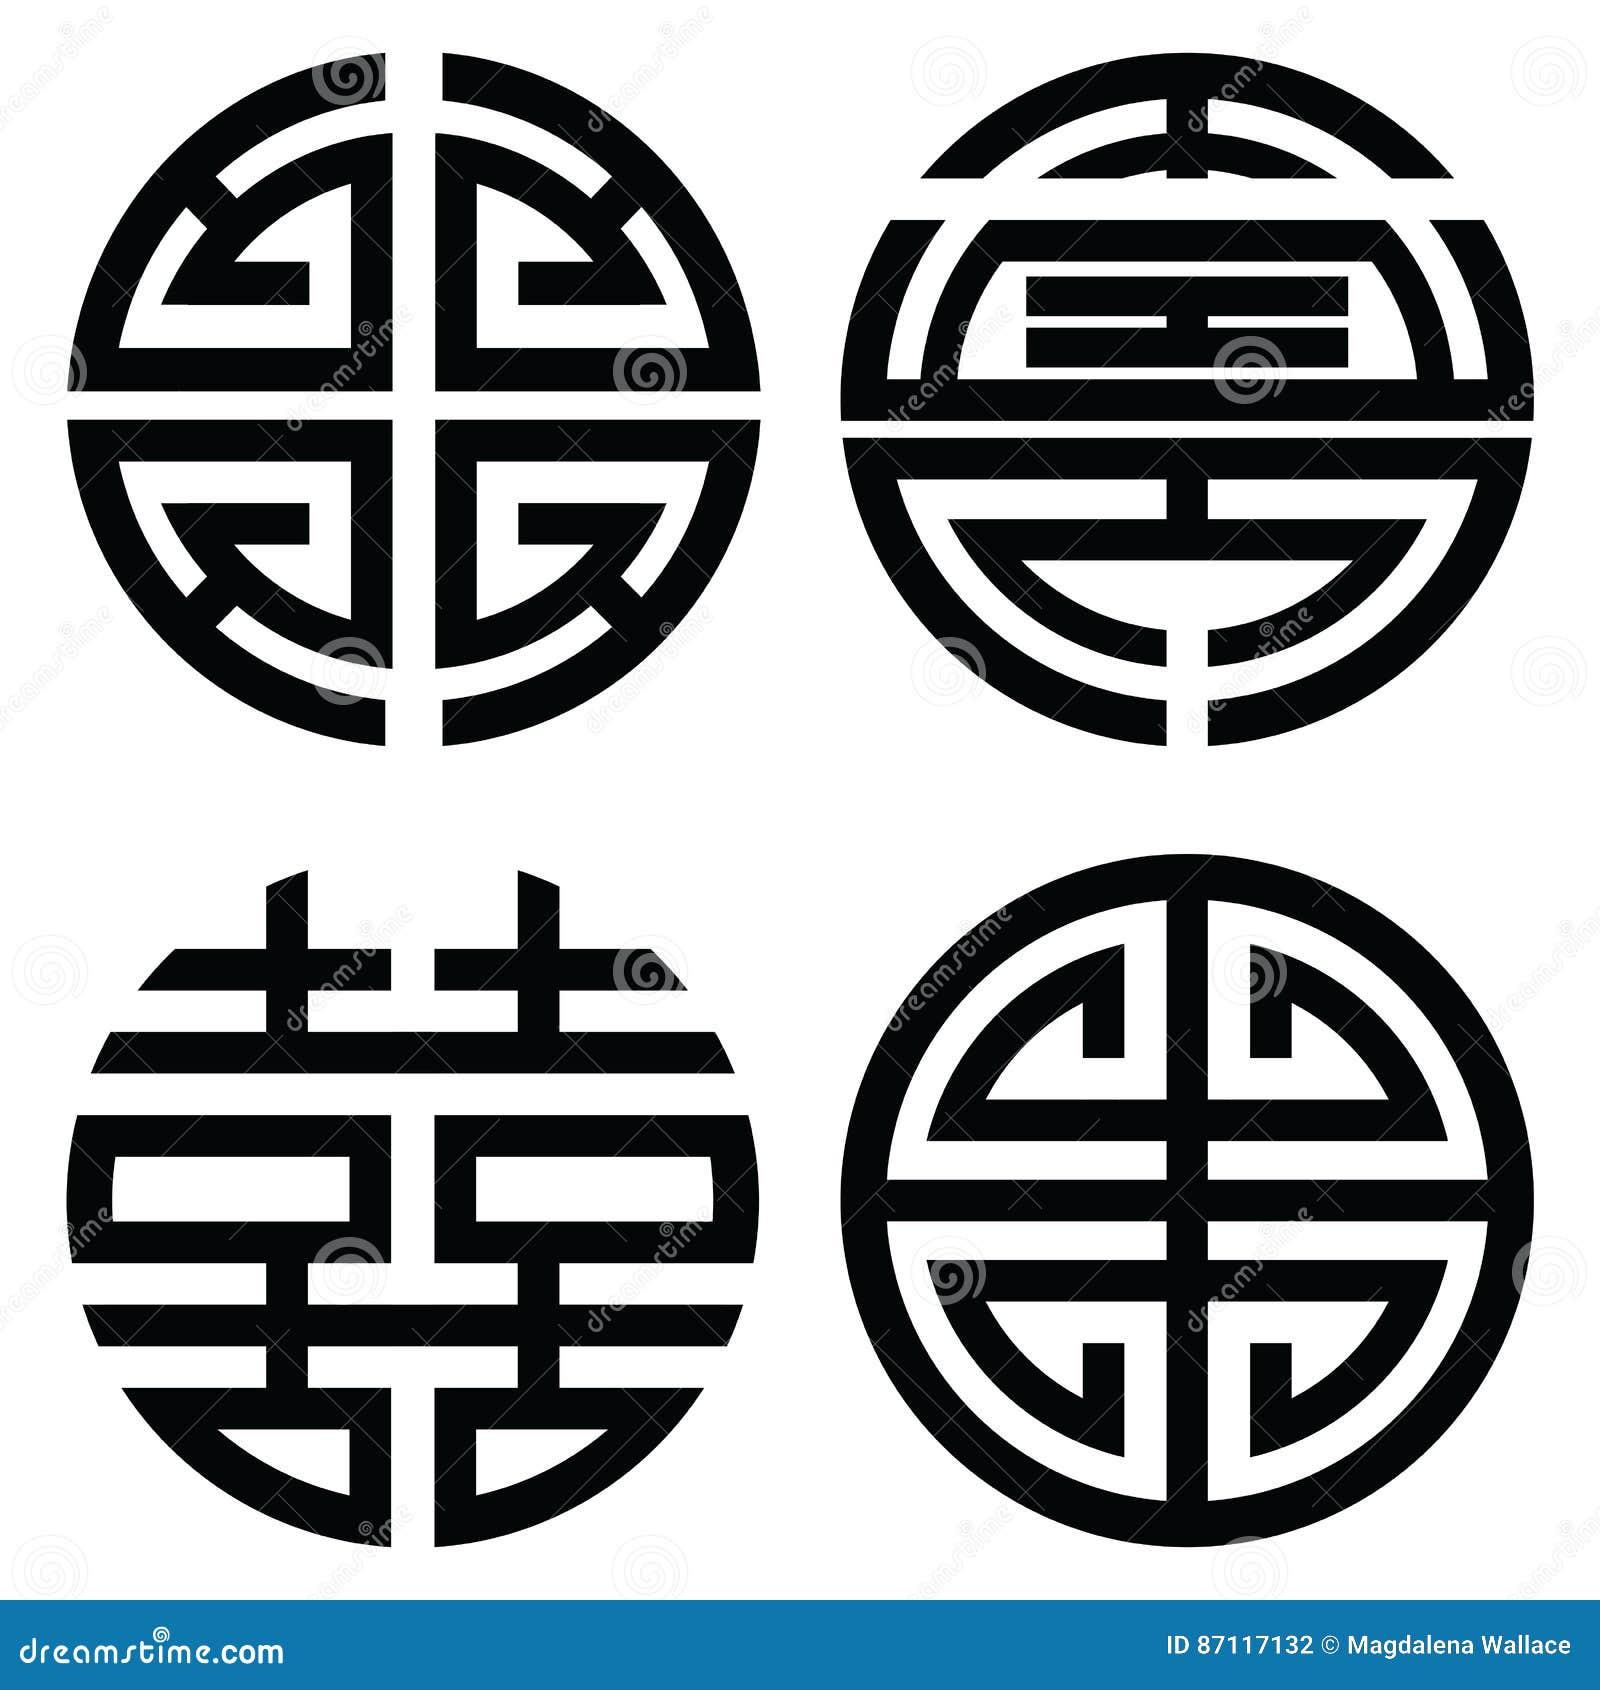 traditional oriental symmetrical zen symbols in black